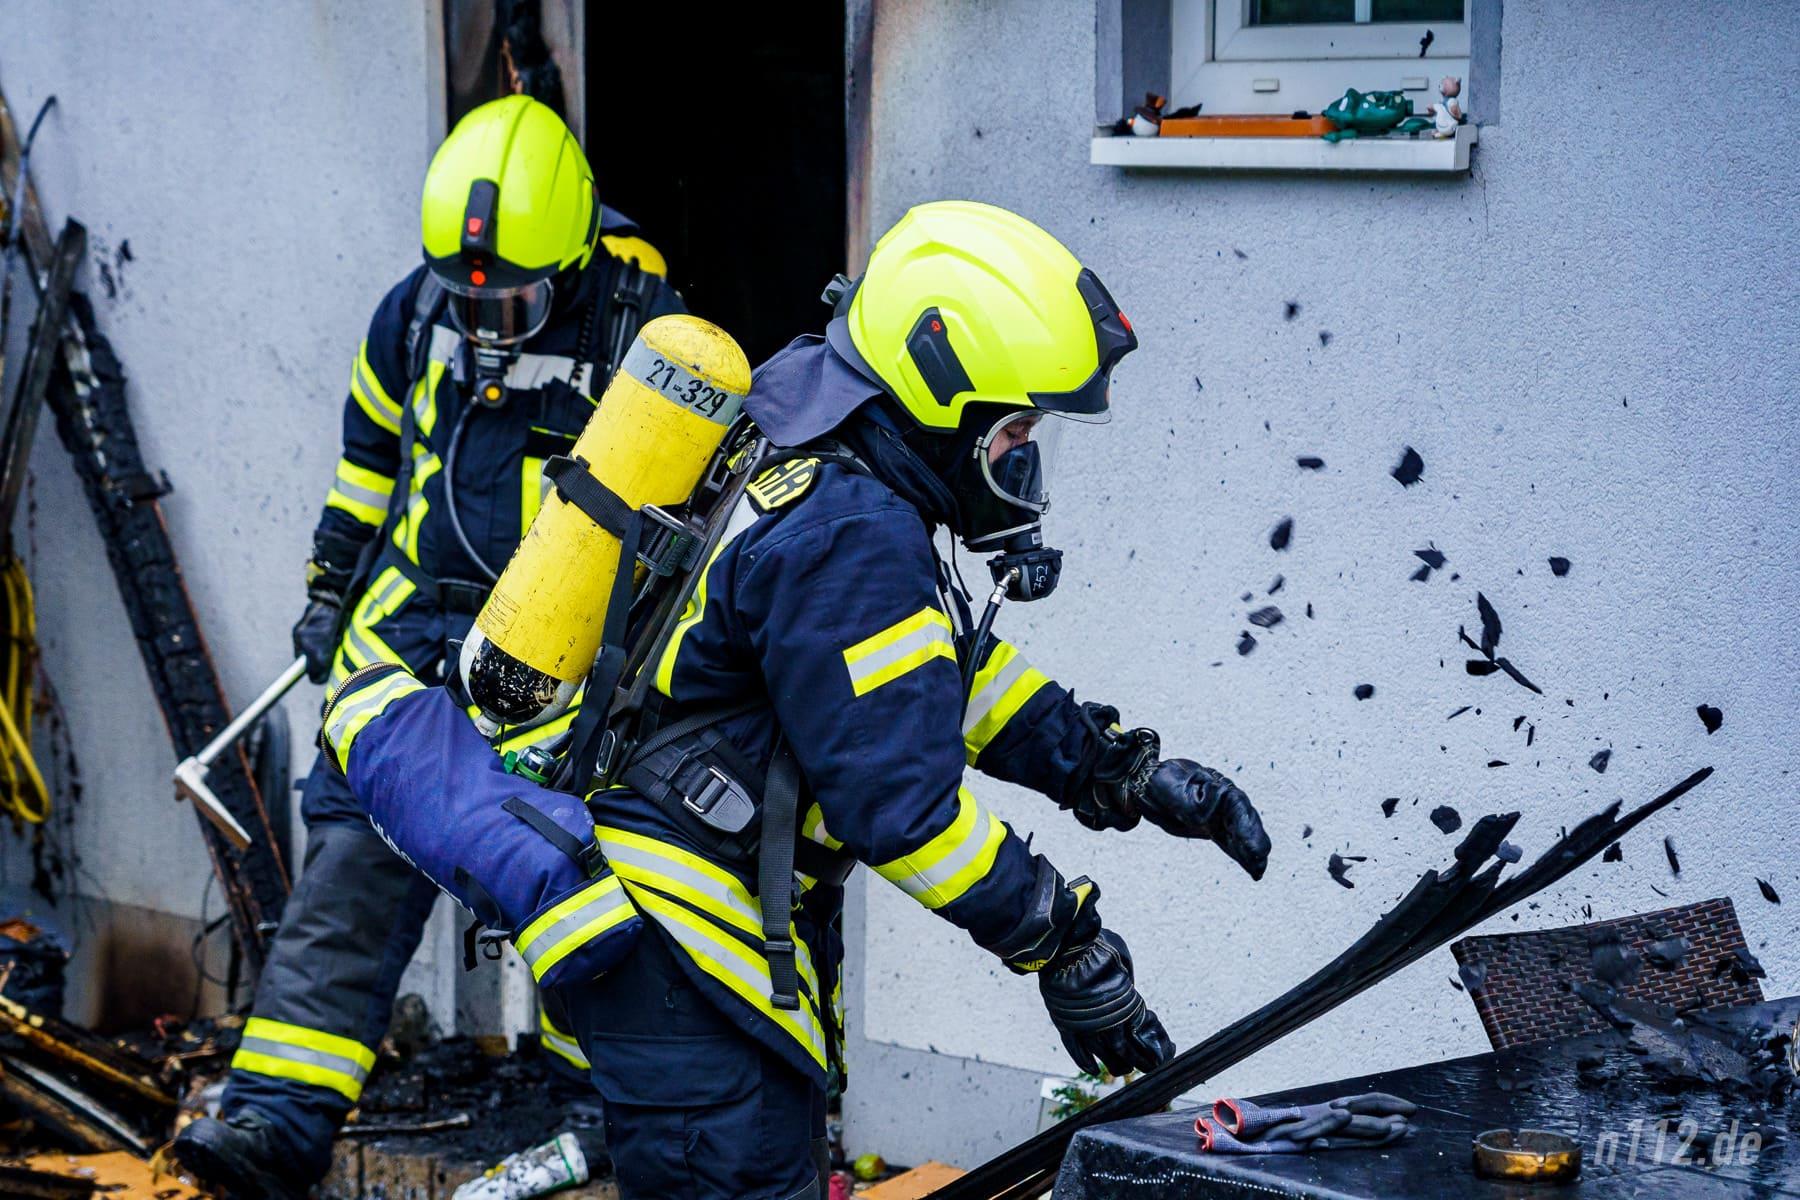 Voller Einsatz unter schwerem Atemschutz (Foto: n112.de/Stefan Simonsen)